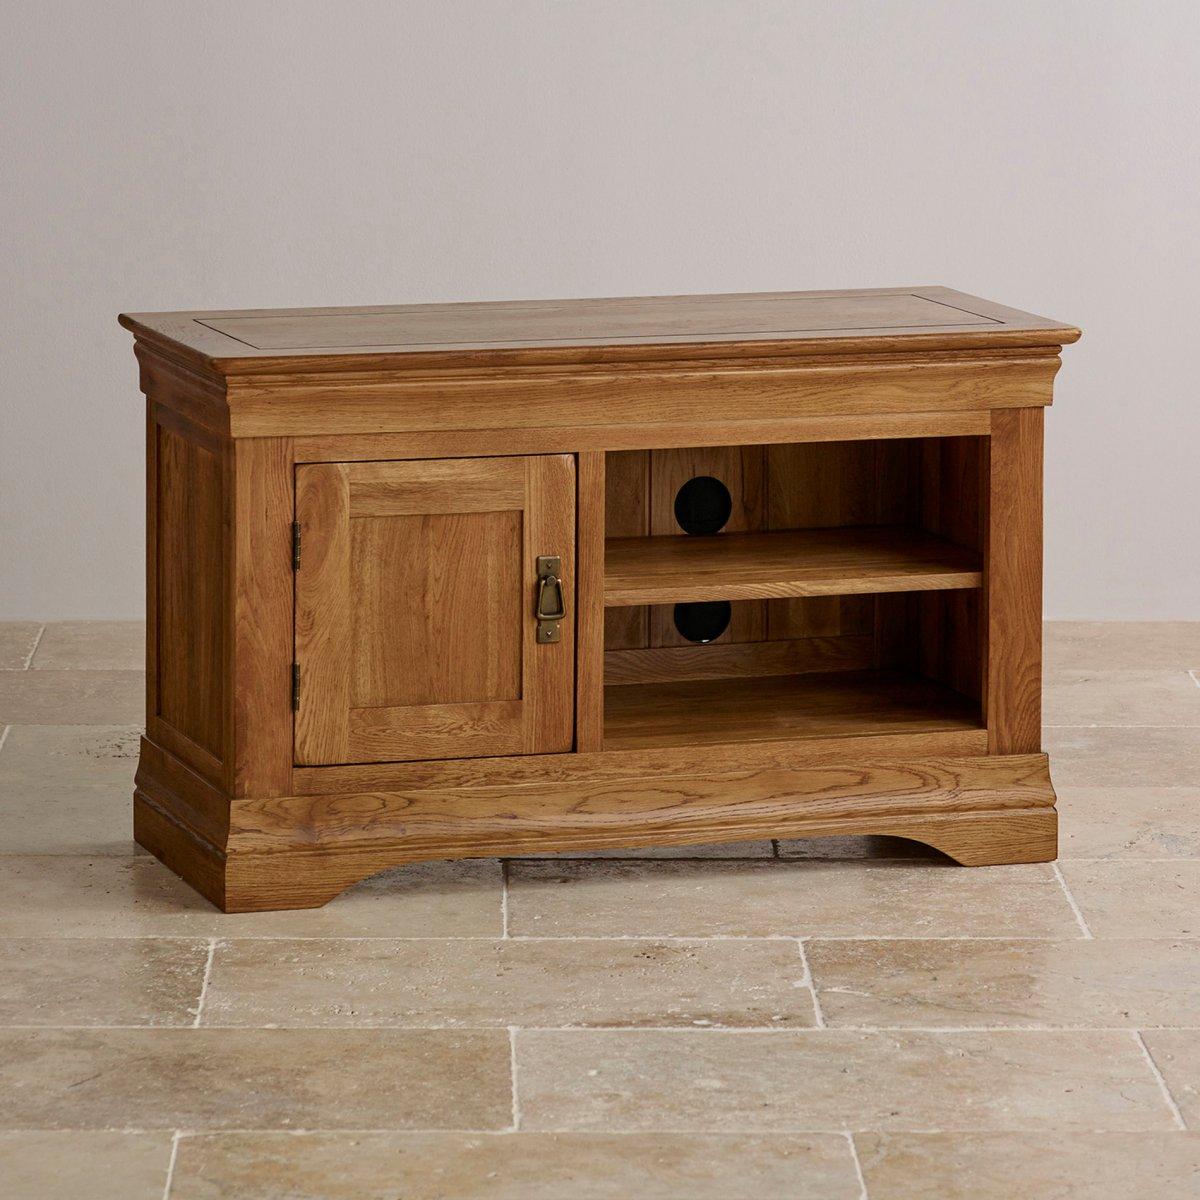 French farmhouse tv cabinet solid oak oak furniture land for Furniture land